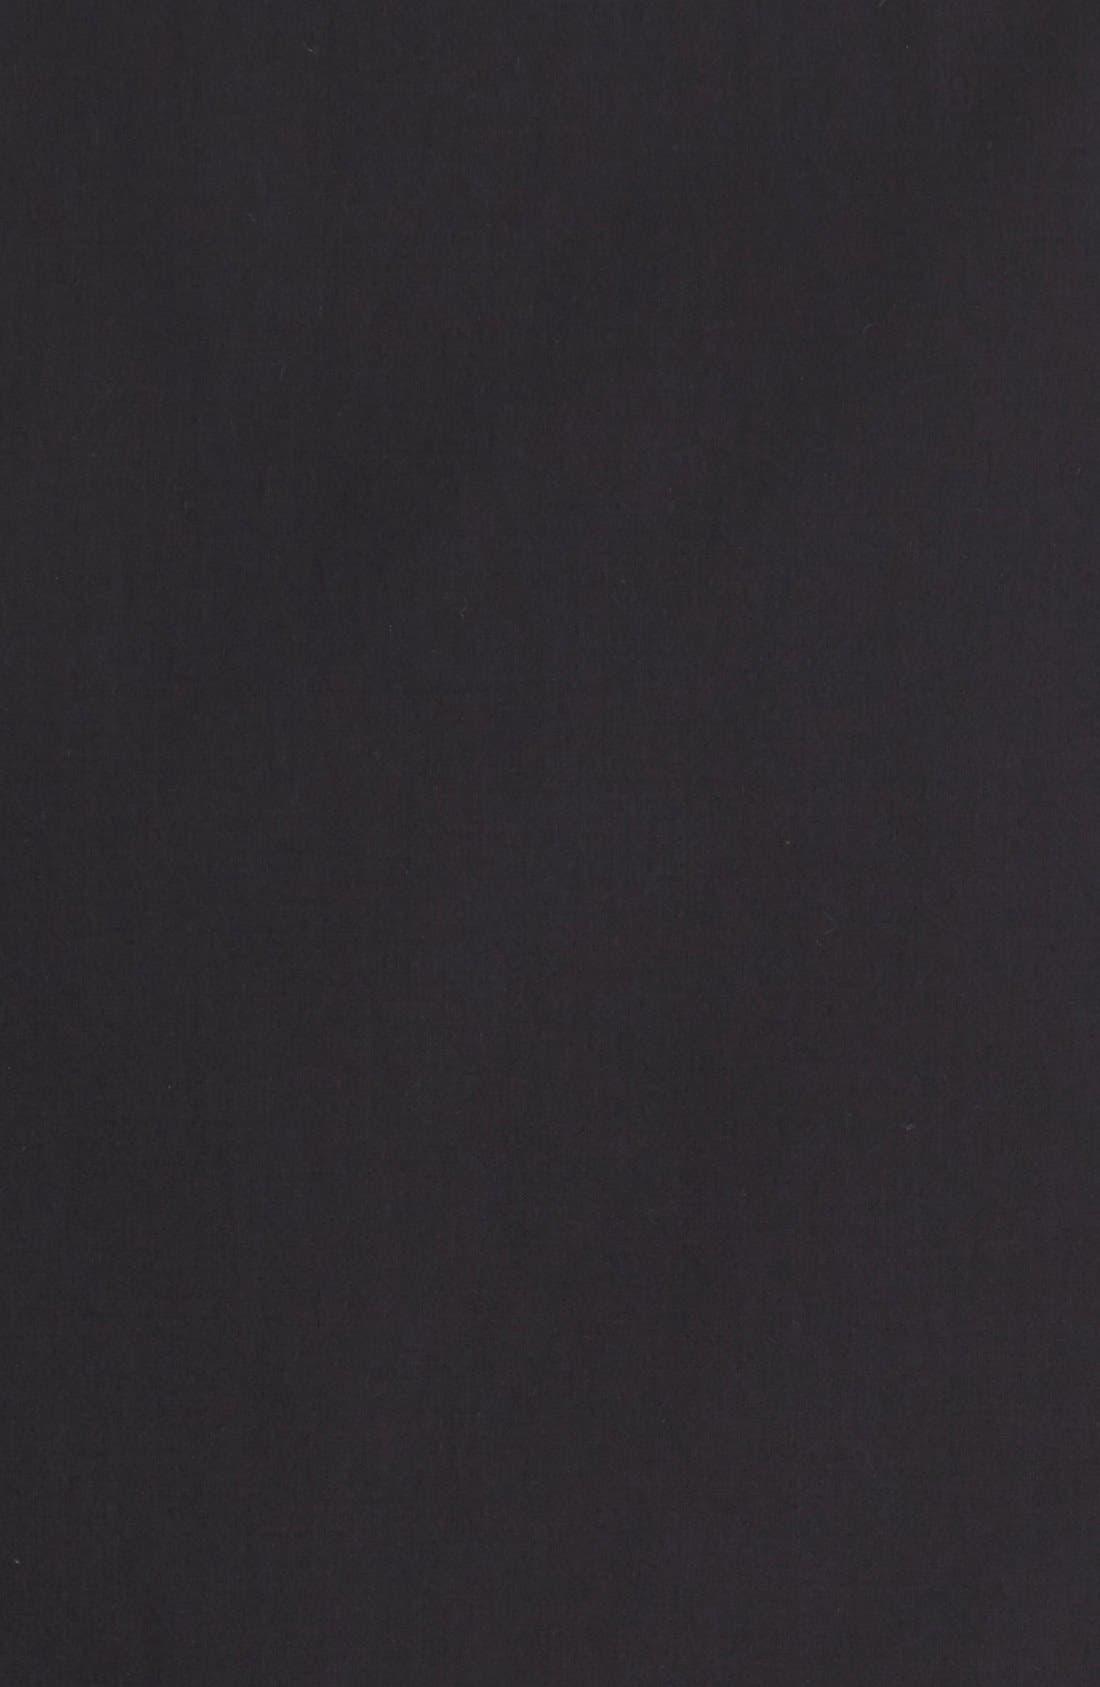 Slim Fit Sport Shirt,                             Alternate thumbnail 2, color,                             BLACK